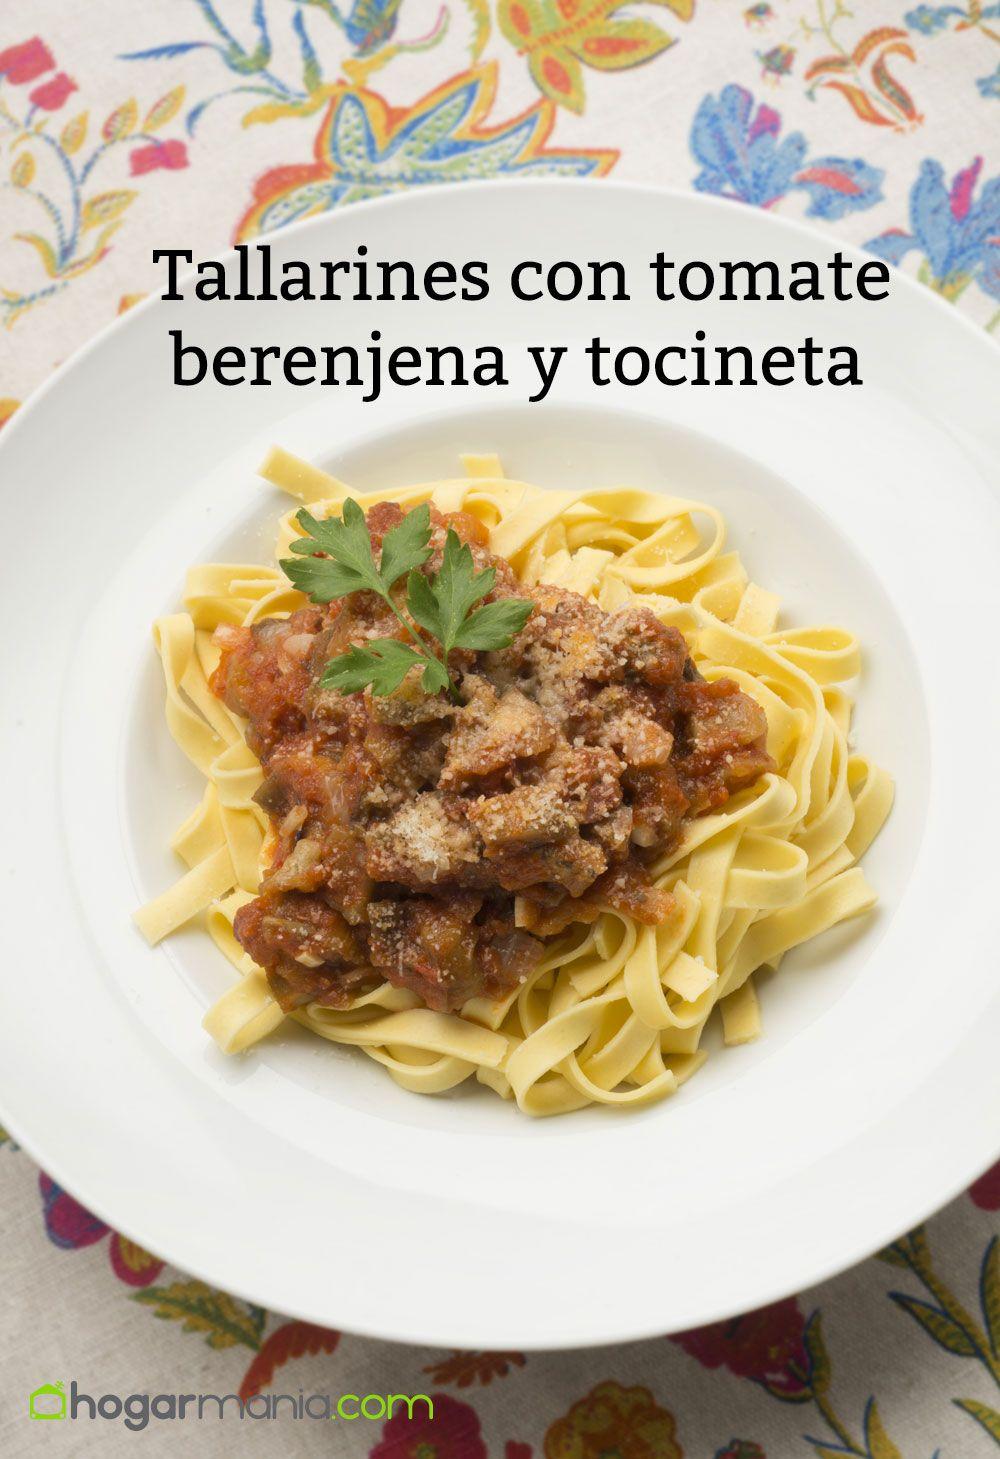 tallarines con tomate berenjena y tocineta